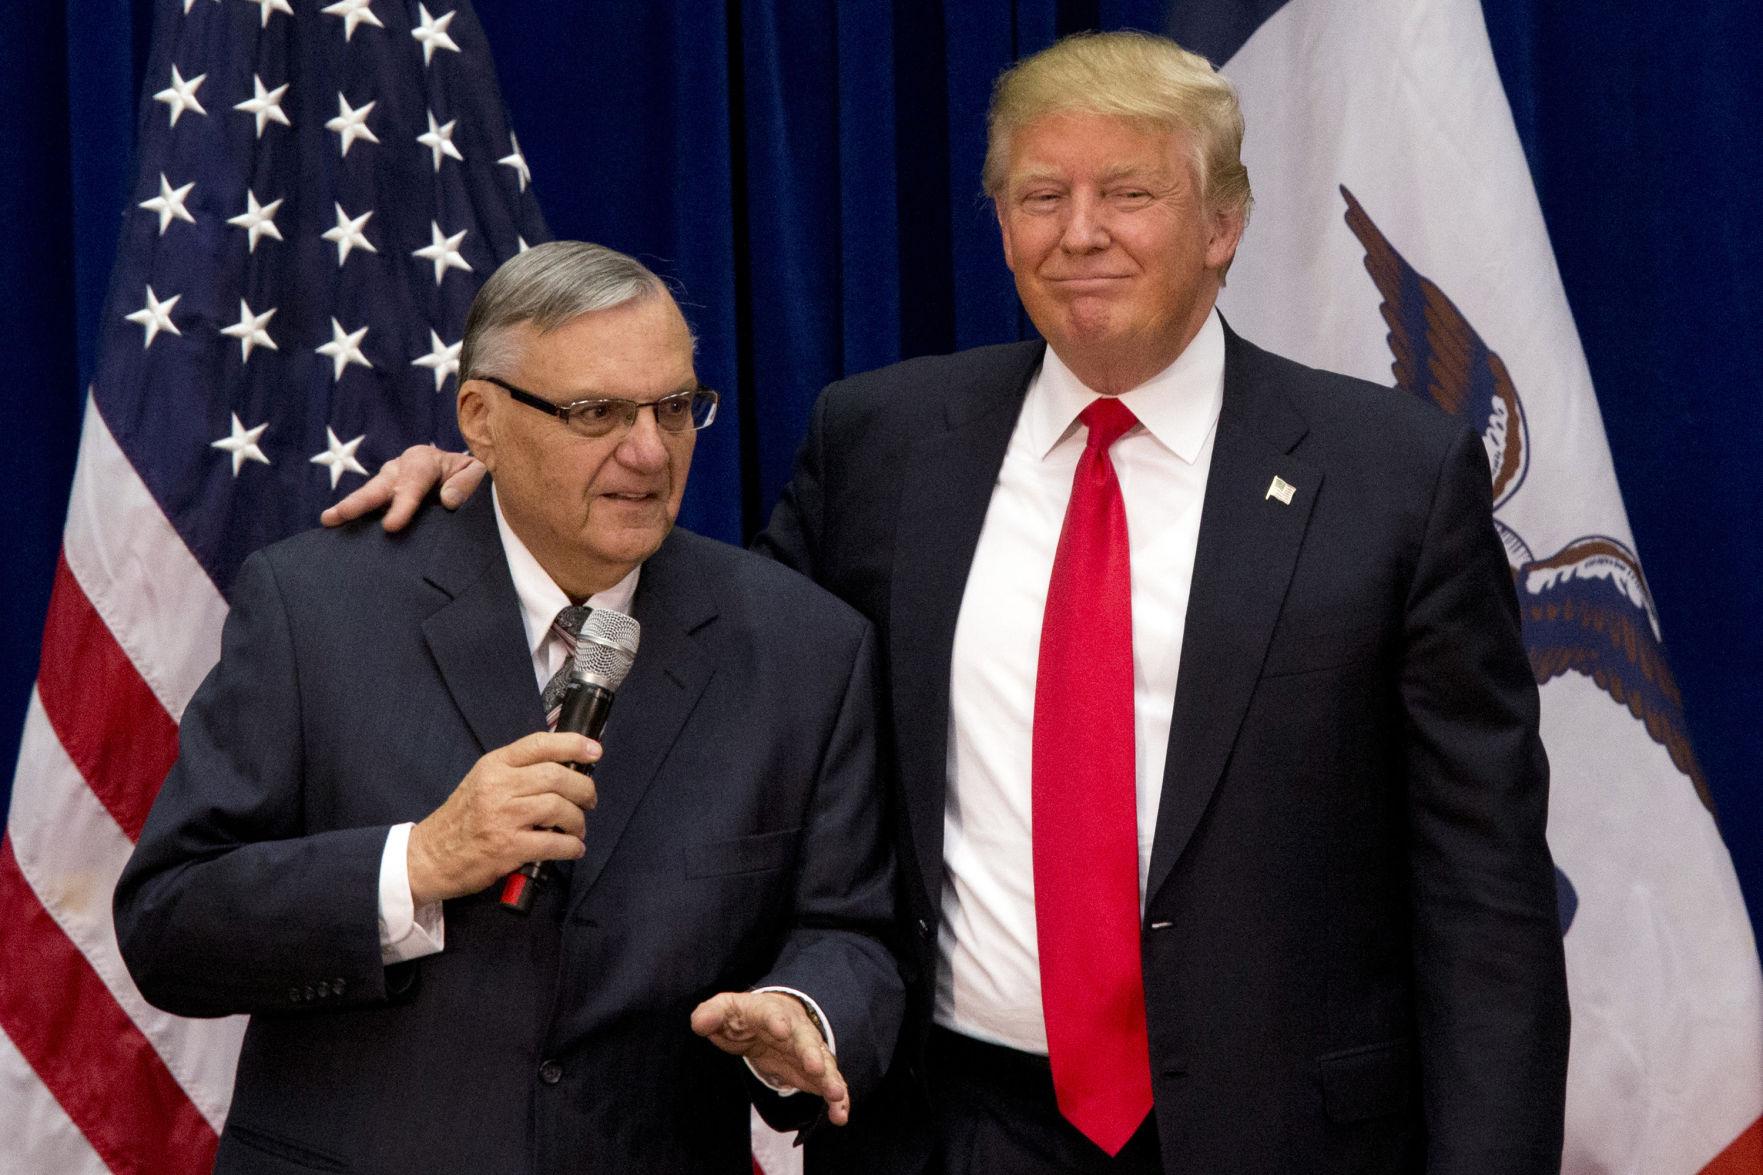 Trump defends pardon of former Arizona sheriff Joe Arpaio